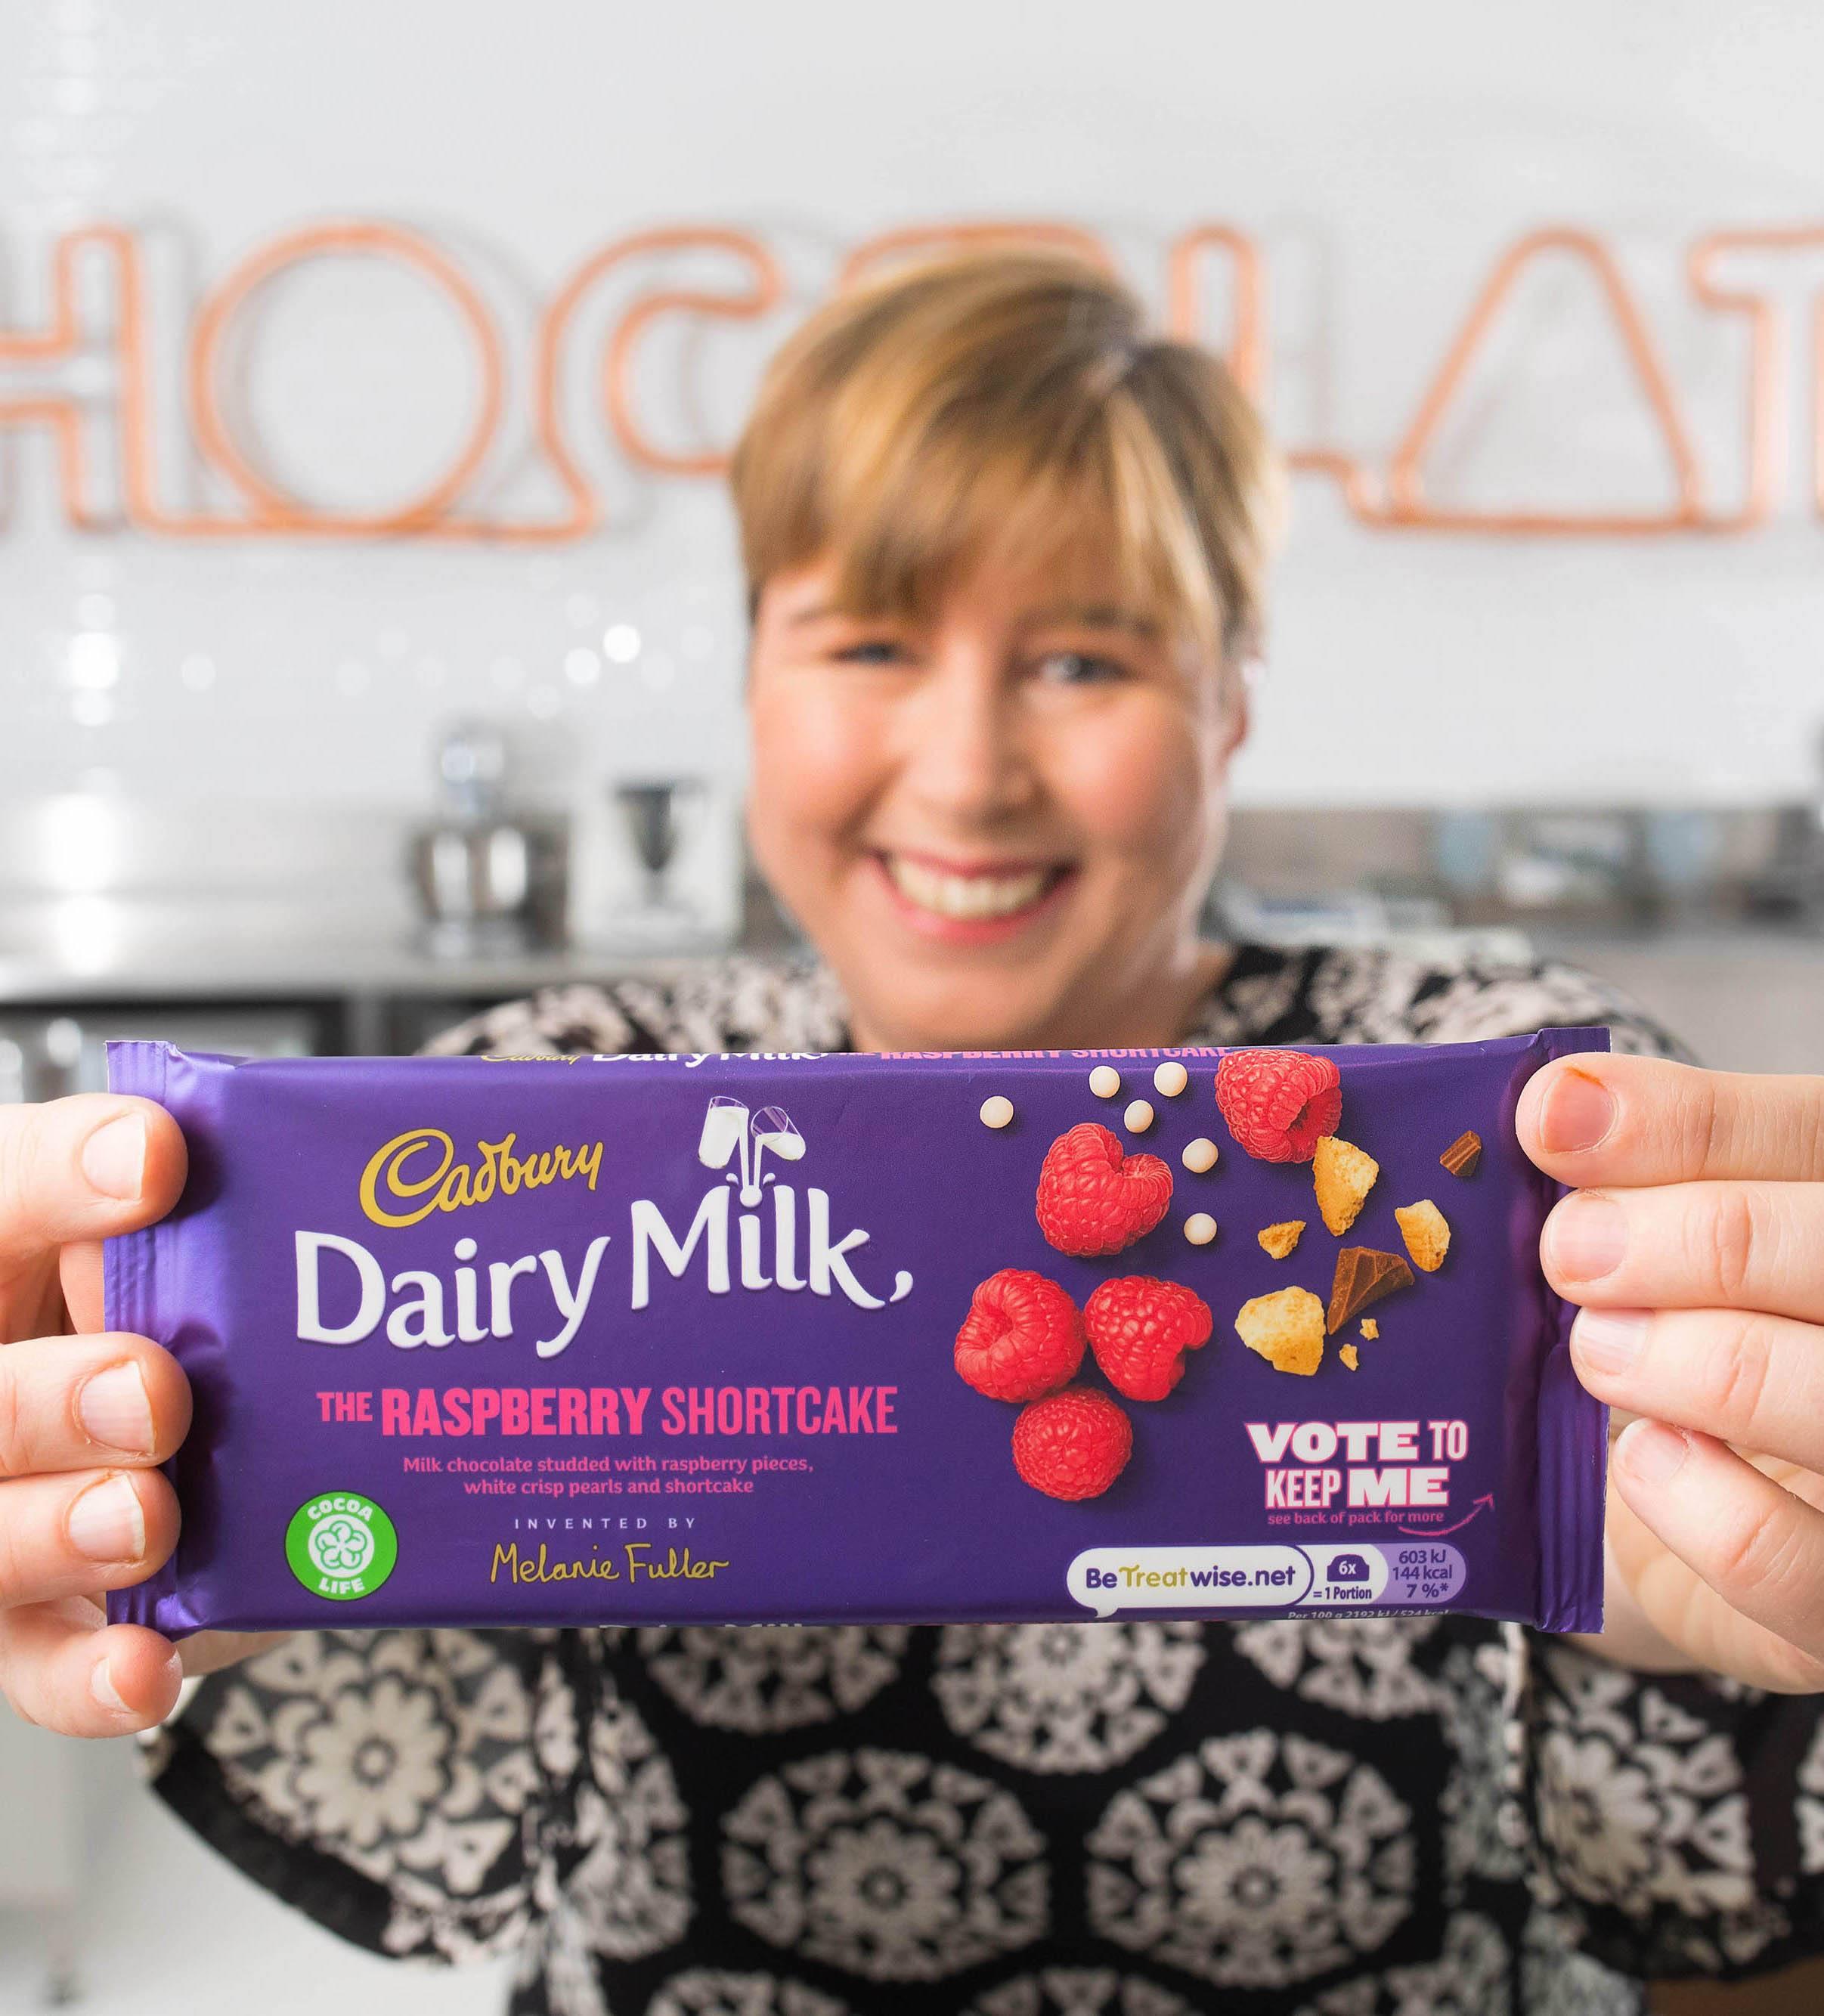 d1c41b12 a2fe 4ec0 a110 60fa60ed8aea Cadbury Launches Three New Special Edition Dairy Milk Bars